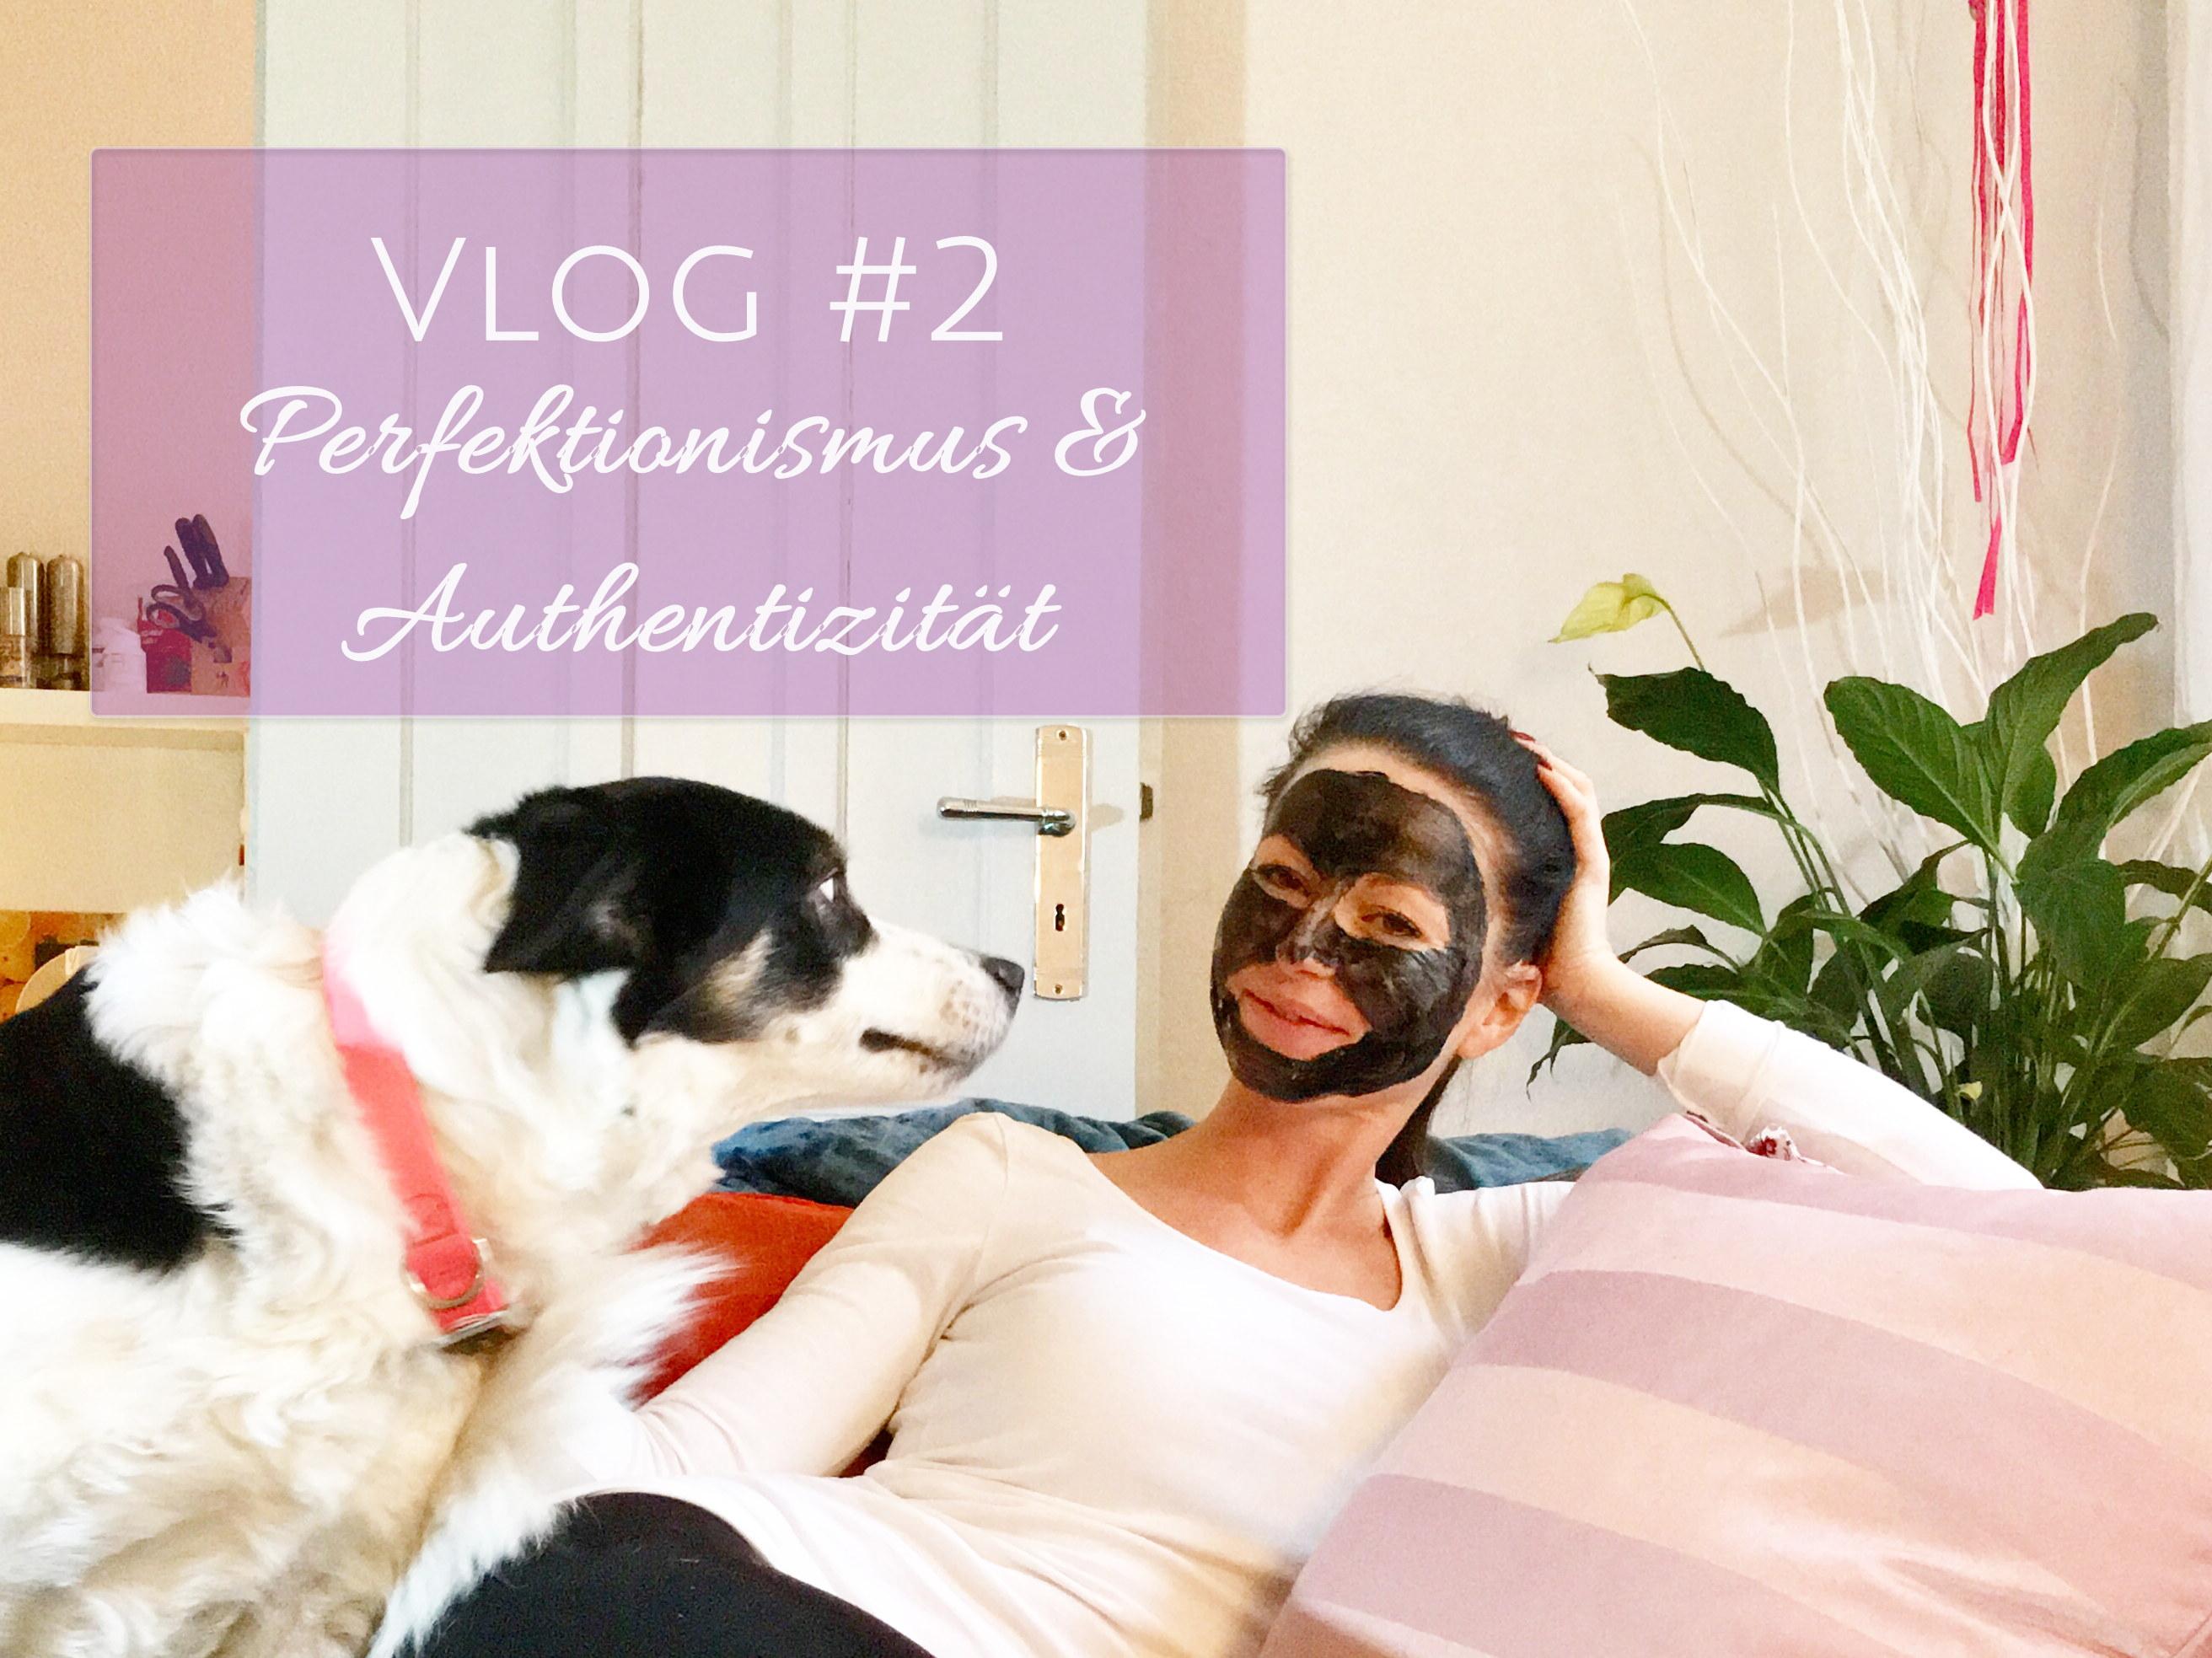 Vlog #2 2018 – Perfektionismus, Authentizität & inneres Glück